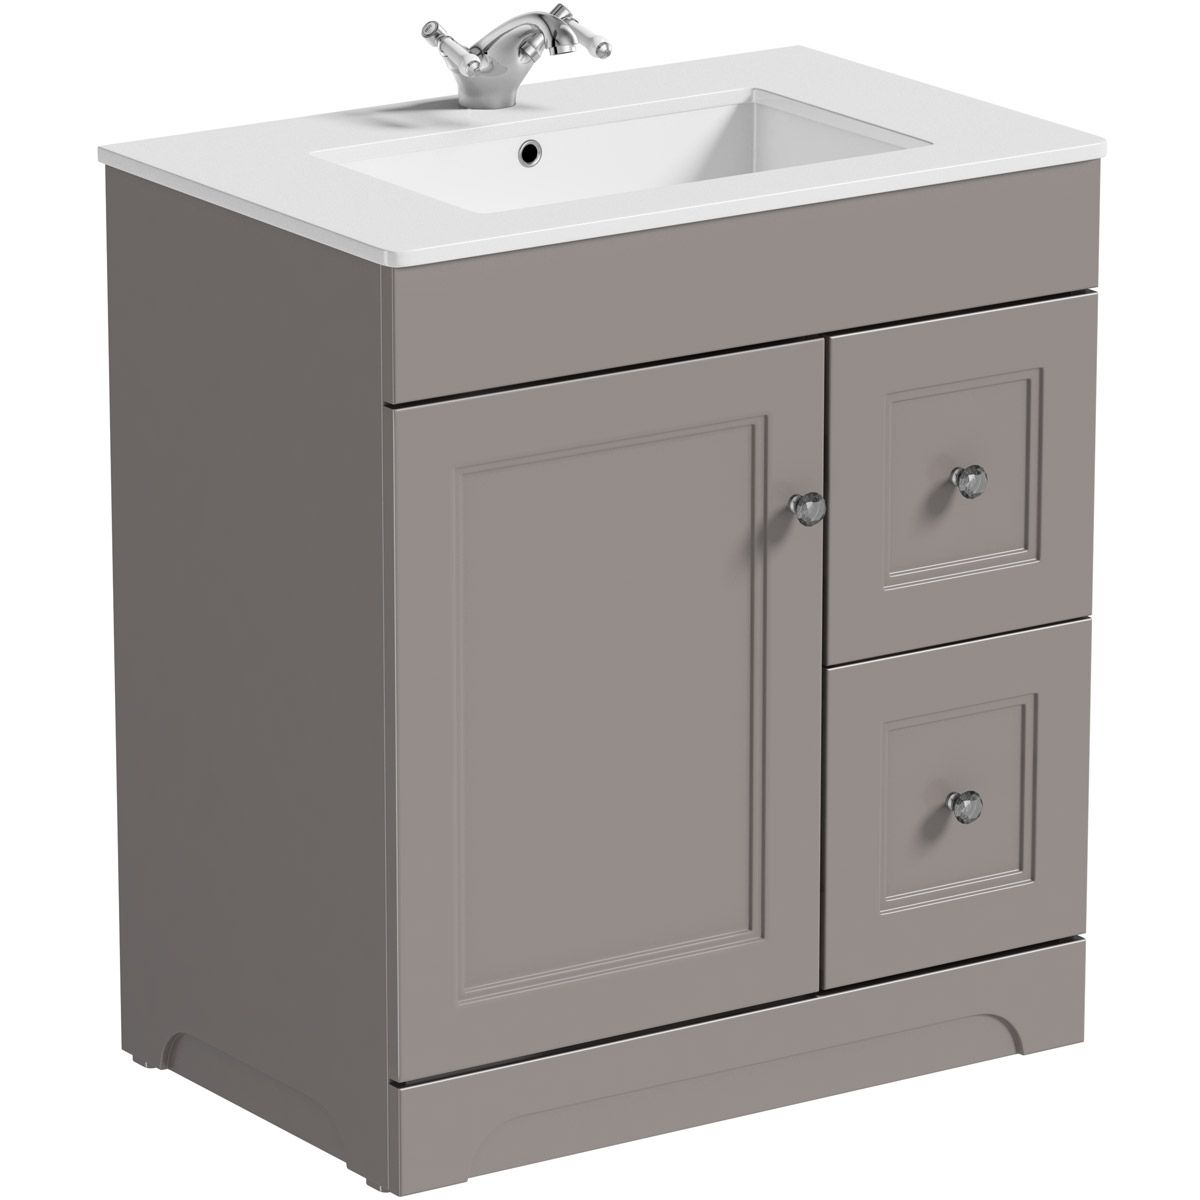 The Bath Co Winchester Graphite Grey Floorstanding Vanity Unit